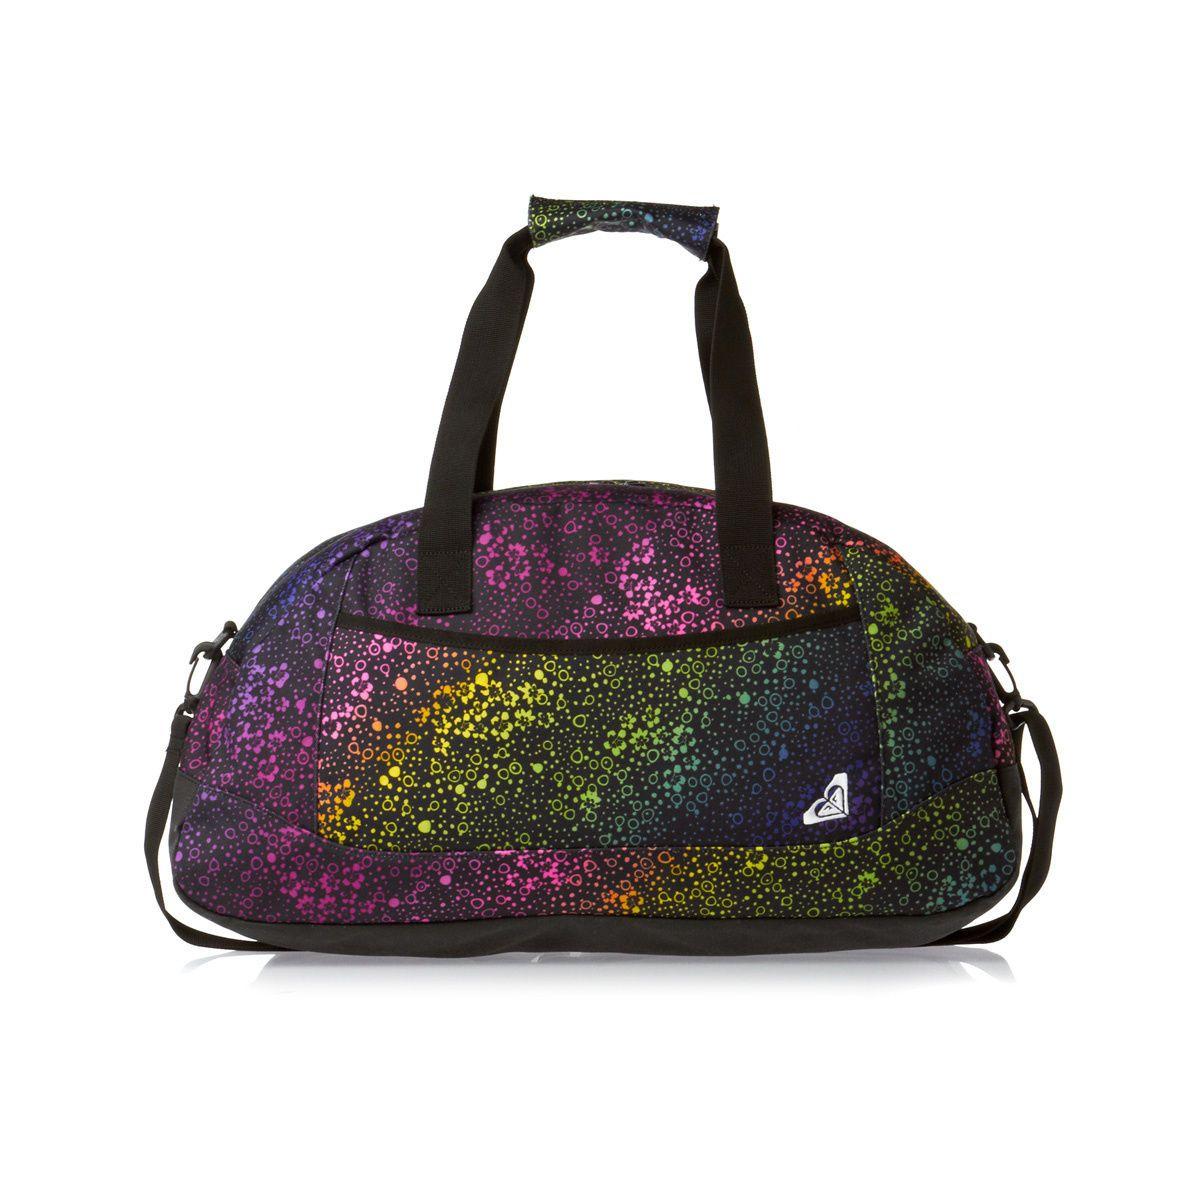 Roxy Sugar Me Up Sports Bag Ultraviolet Free Uk Delivery